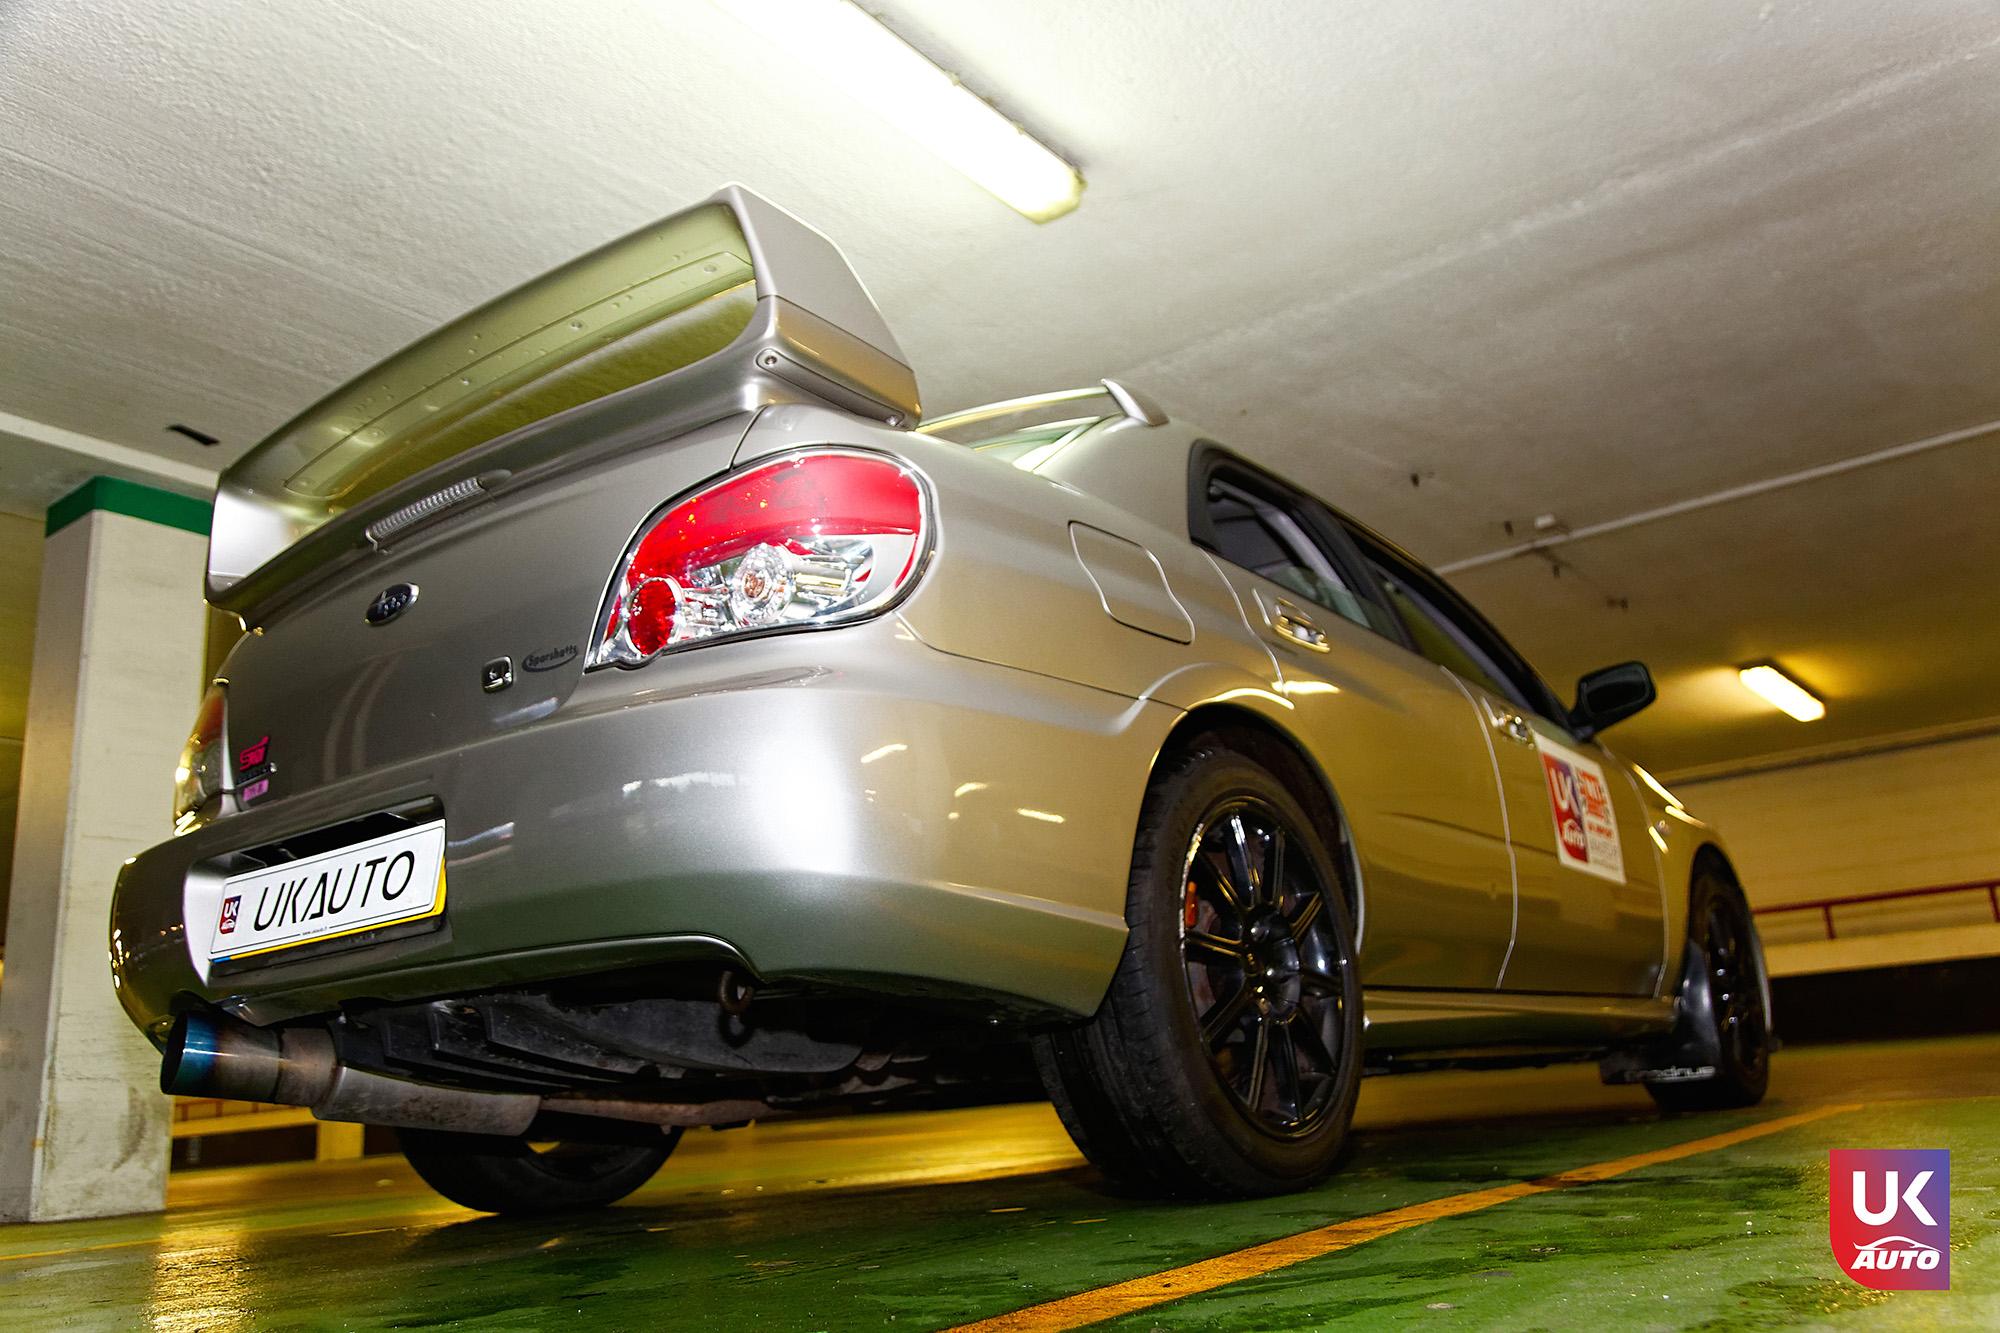 import subaru impreza wrx sti rhd import voiture angleterre auto import6 - Felecitation a Christophe pour cette Subaru Impreza Wrx Sti RHD Supercharged Importation voiture angleterre